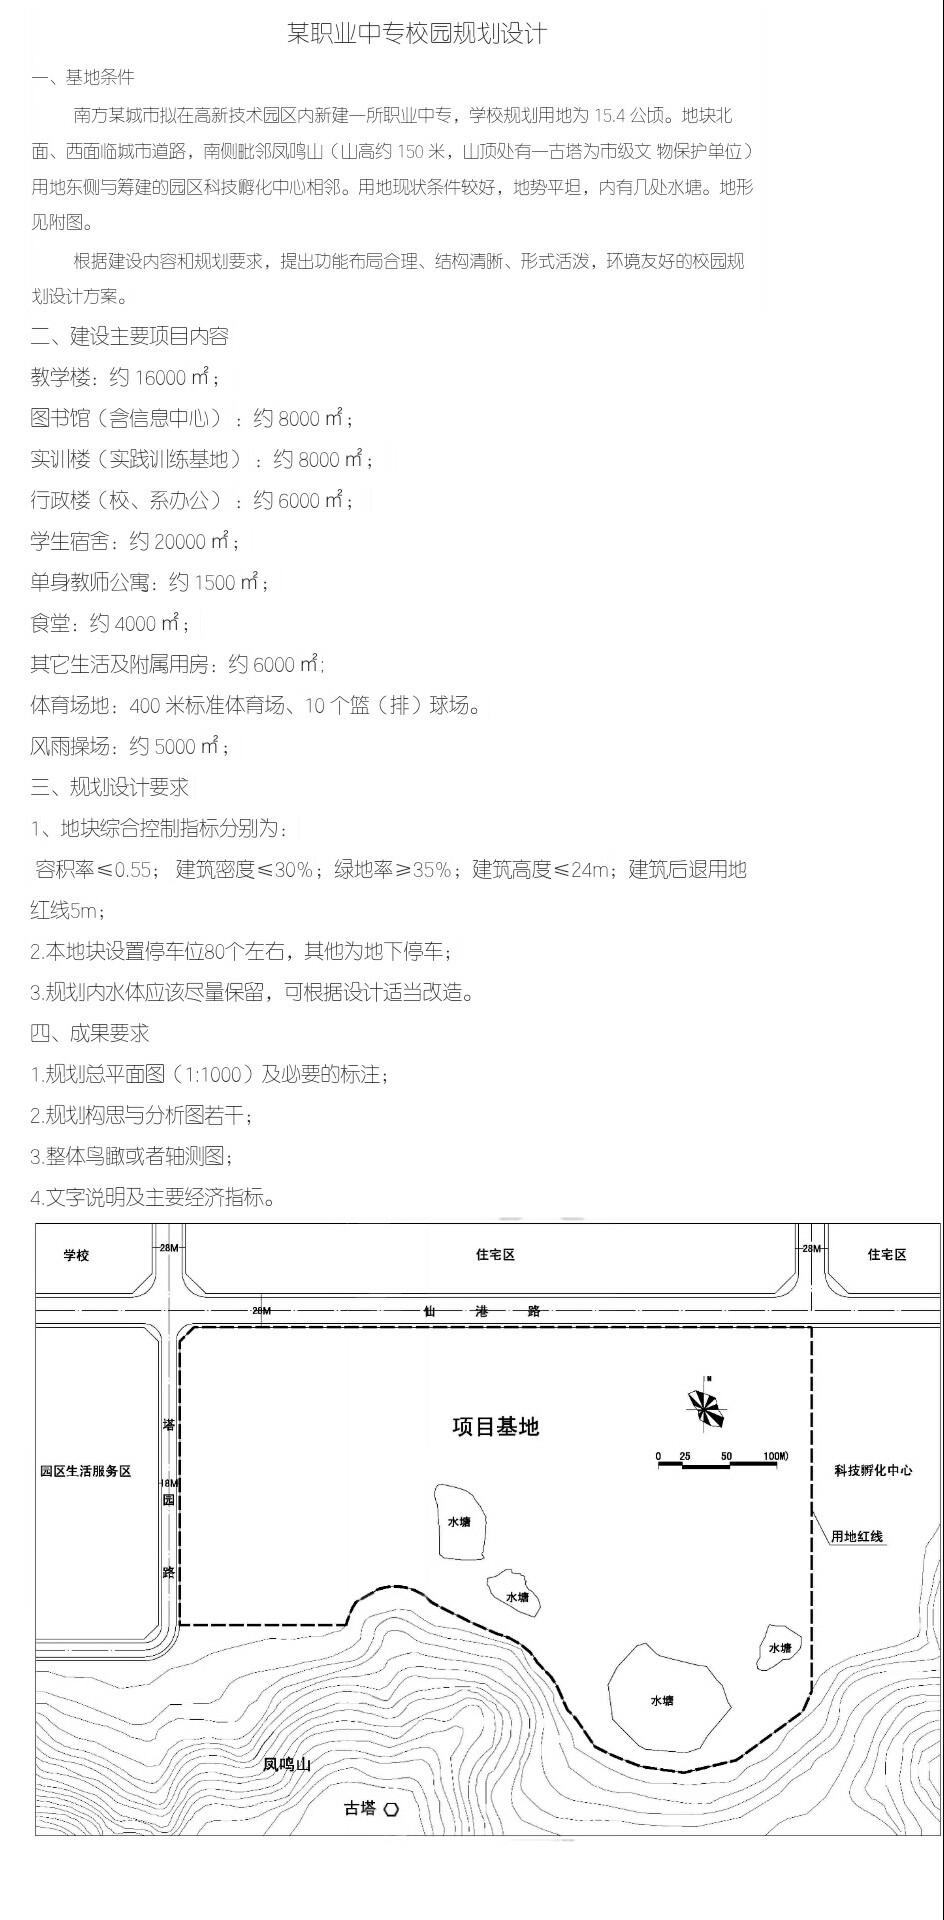 S70819-195539(1).jpg